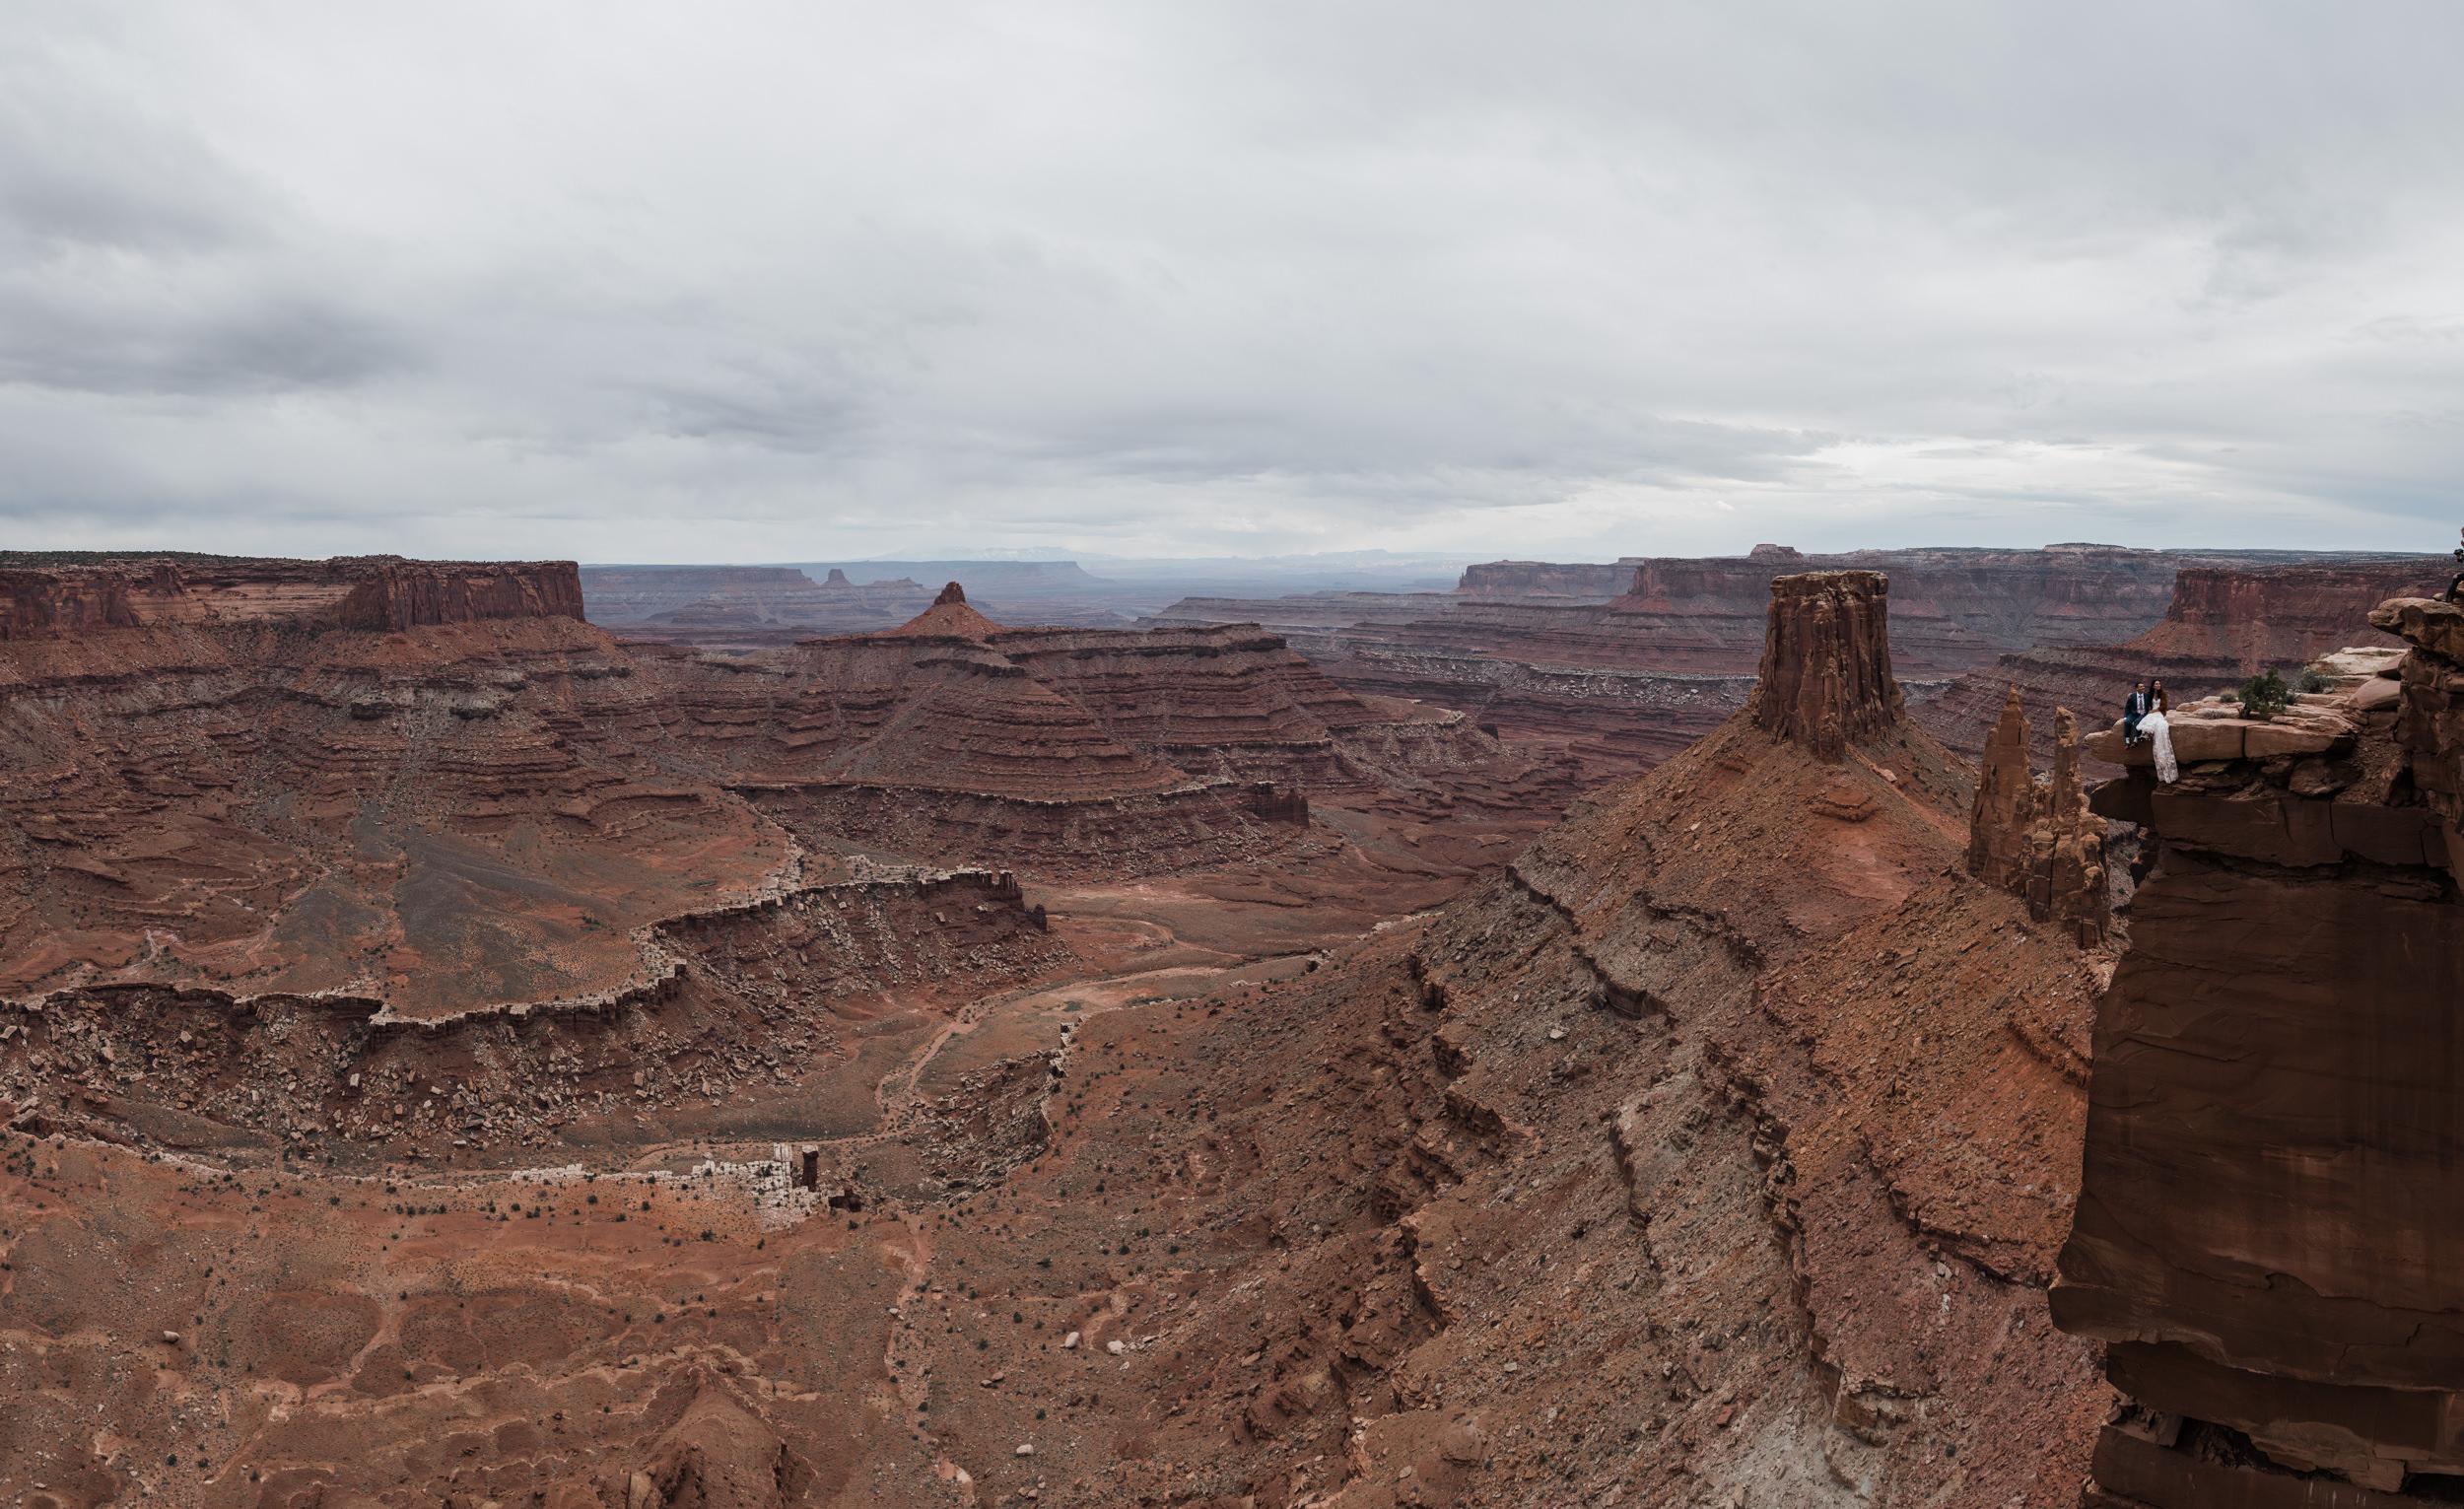 Jeep-Wedding-Moab-Utah-Hearnes-Adventure-Elopement-Photography-44.jpg